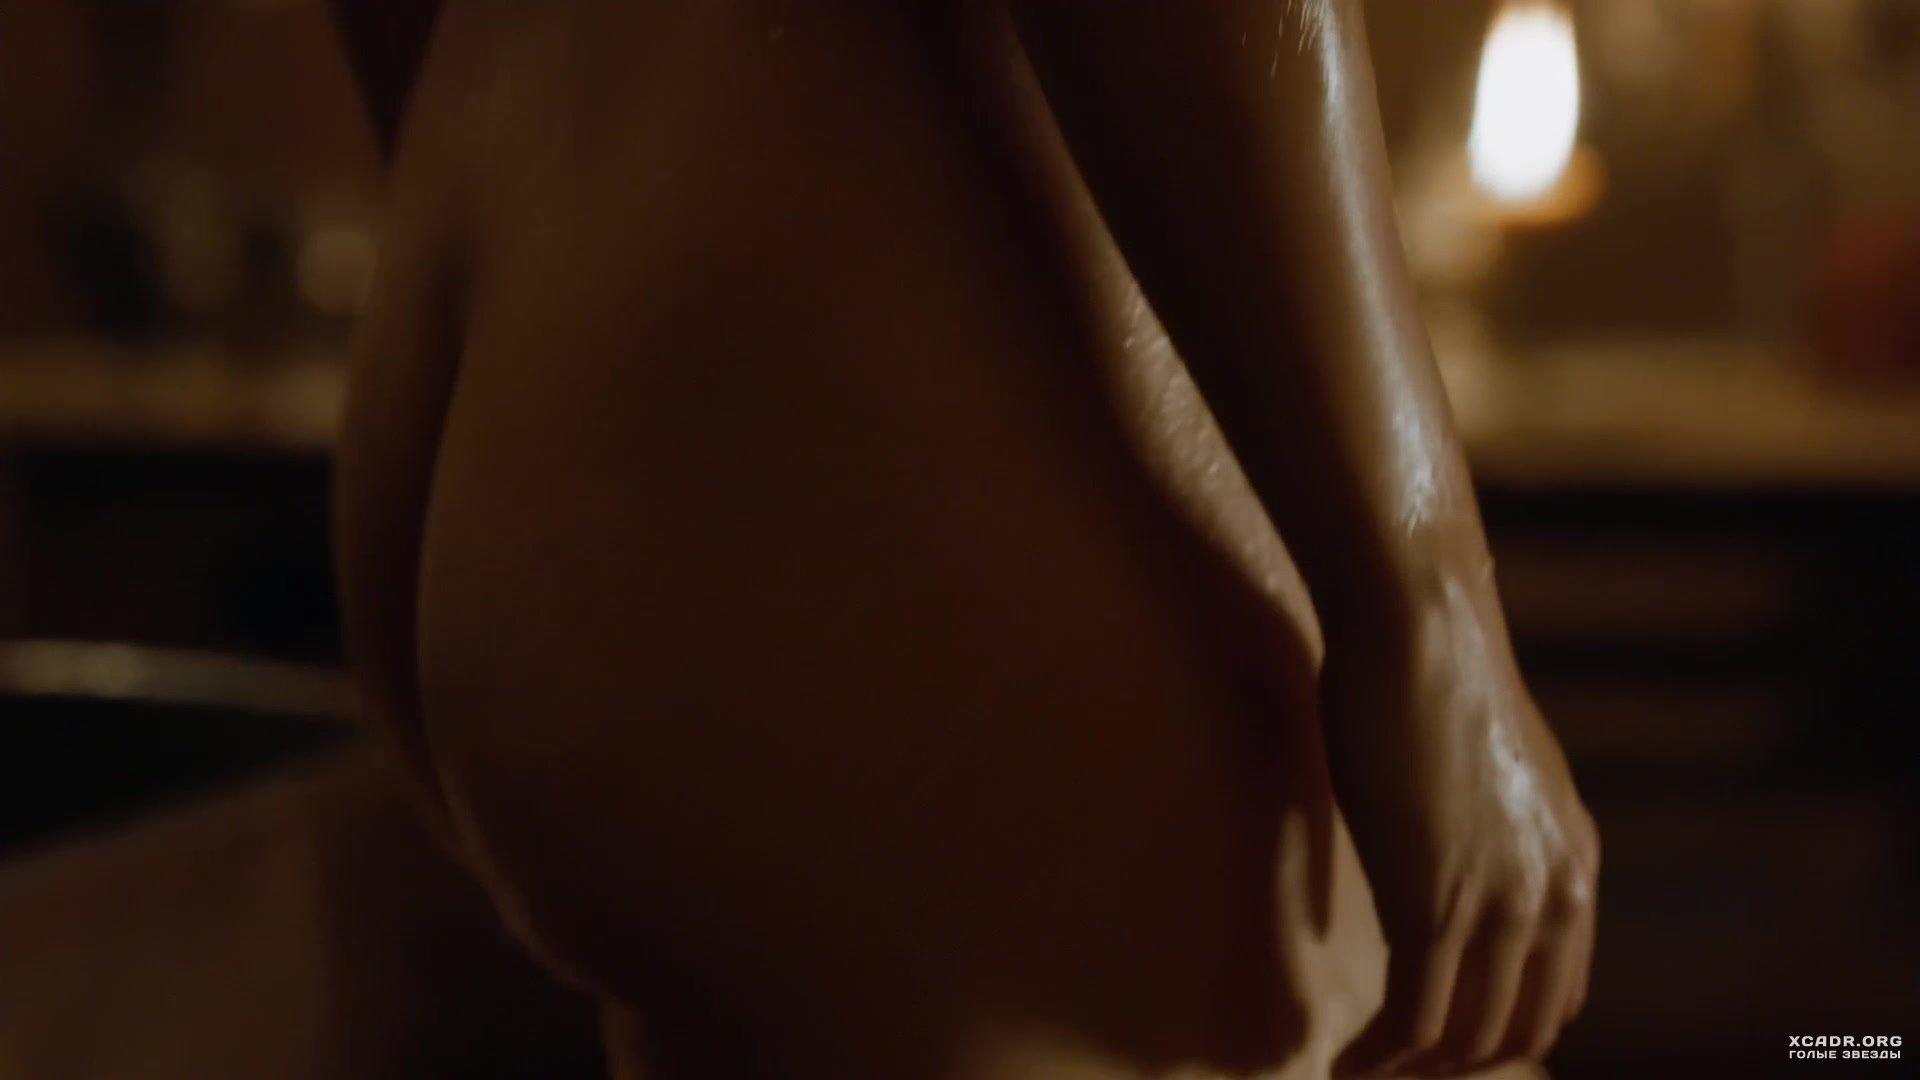 Pics of trinas butt, white sex black